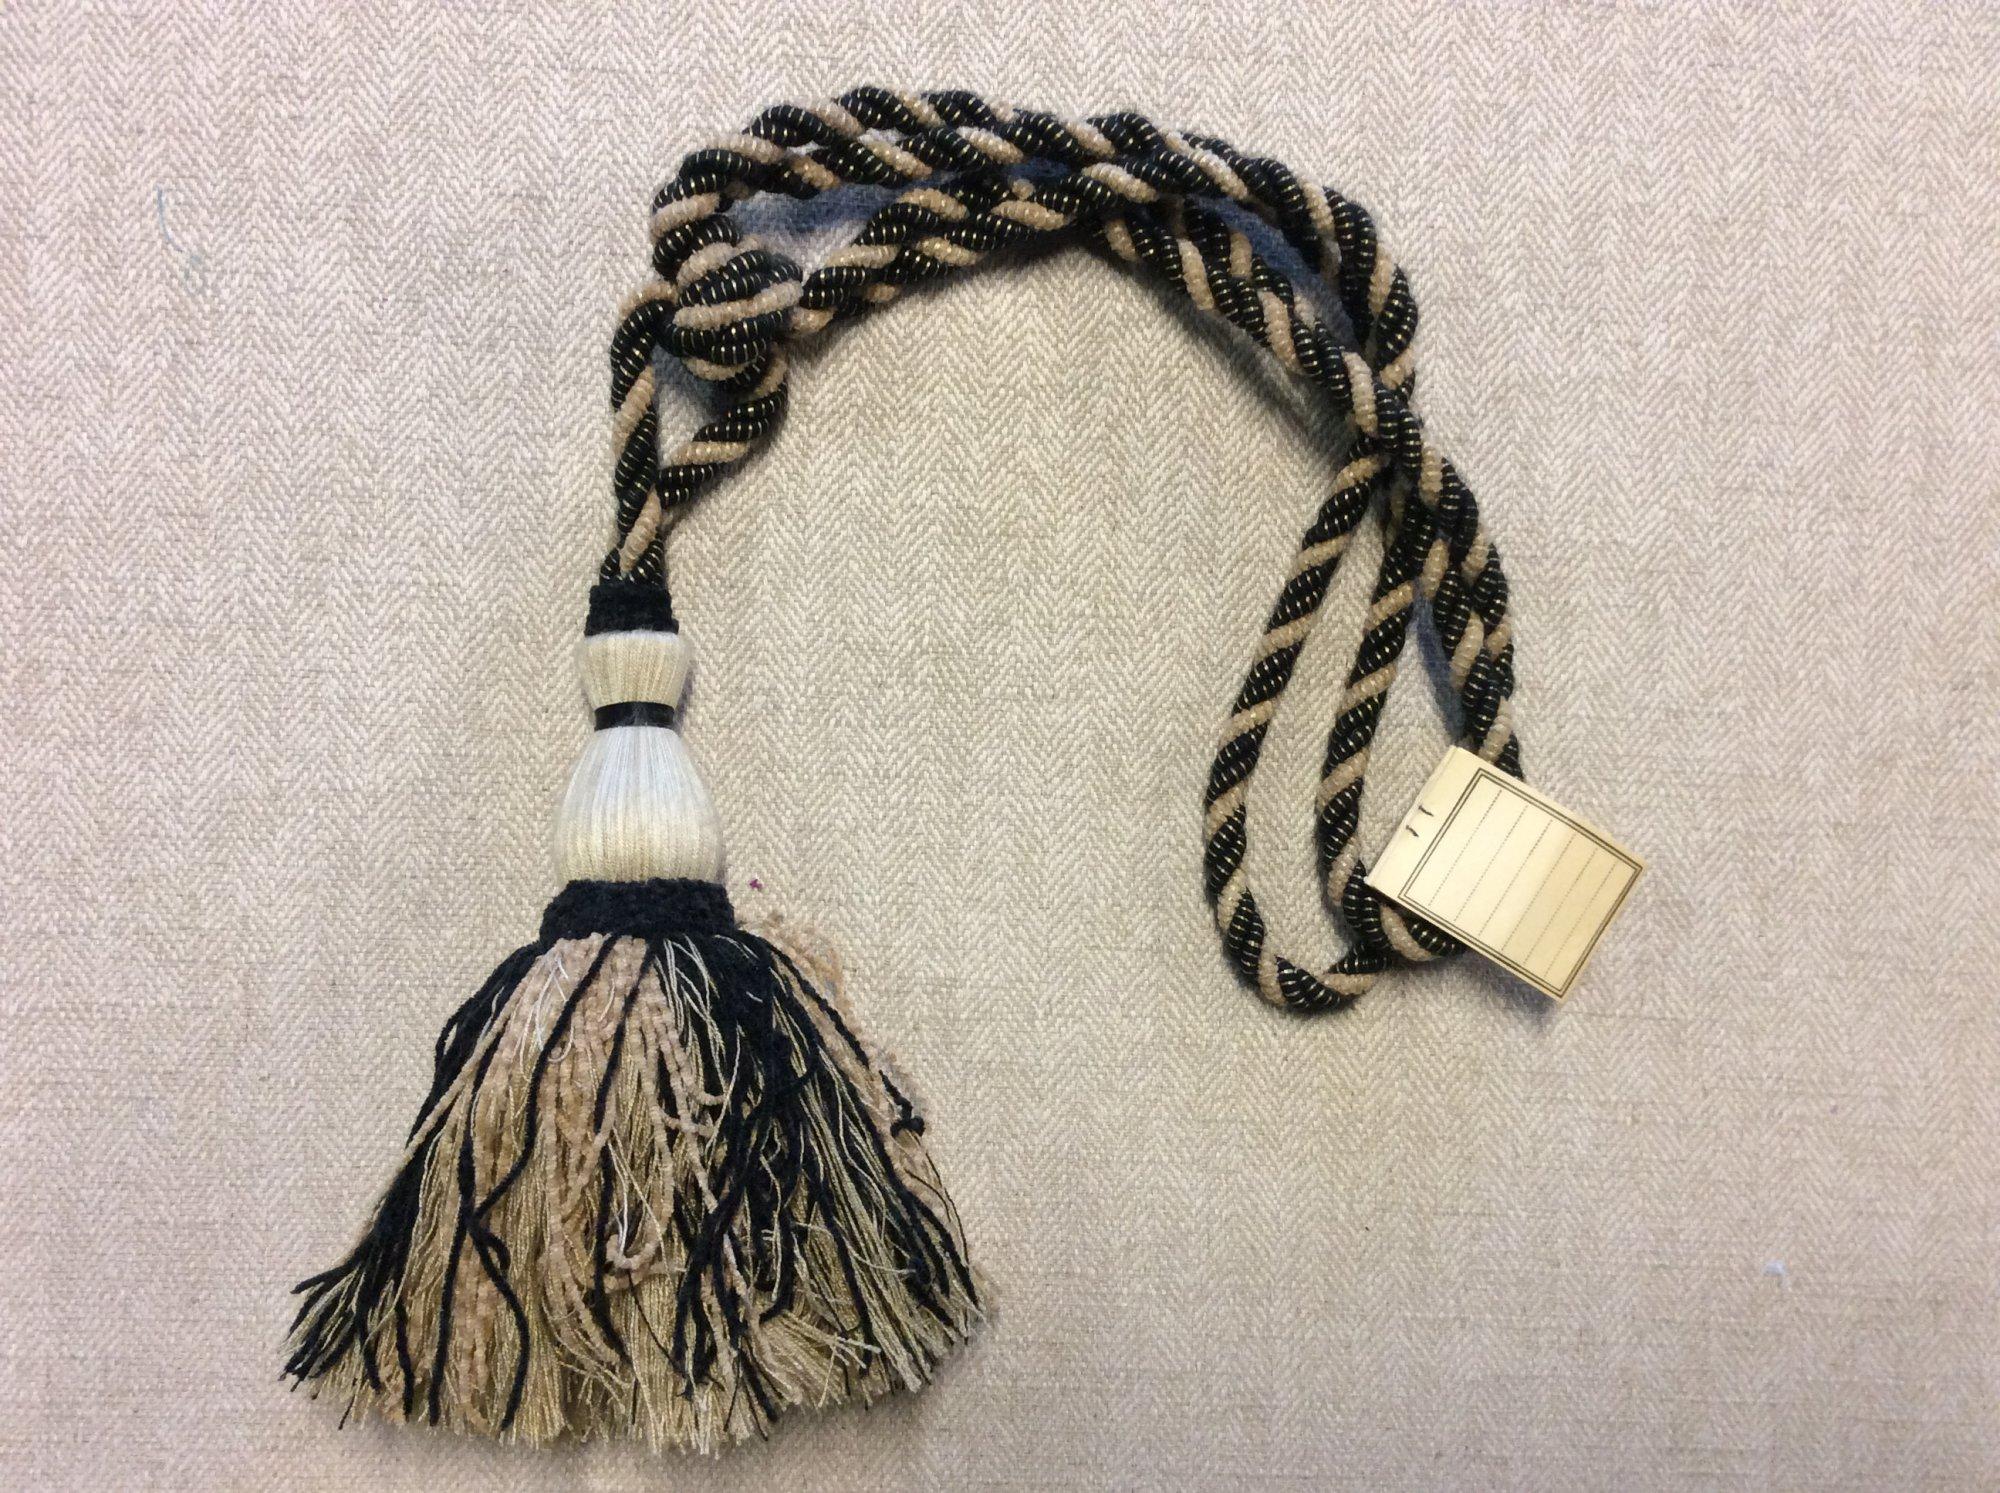 Vintage Brunschwig and Fils Single Tassel Tieback Black and Camel Cotton Drapery Home Decor Tassel 39031-M09